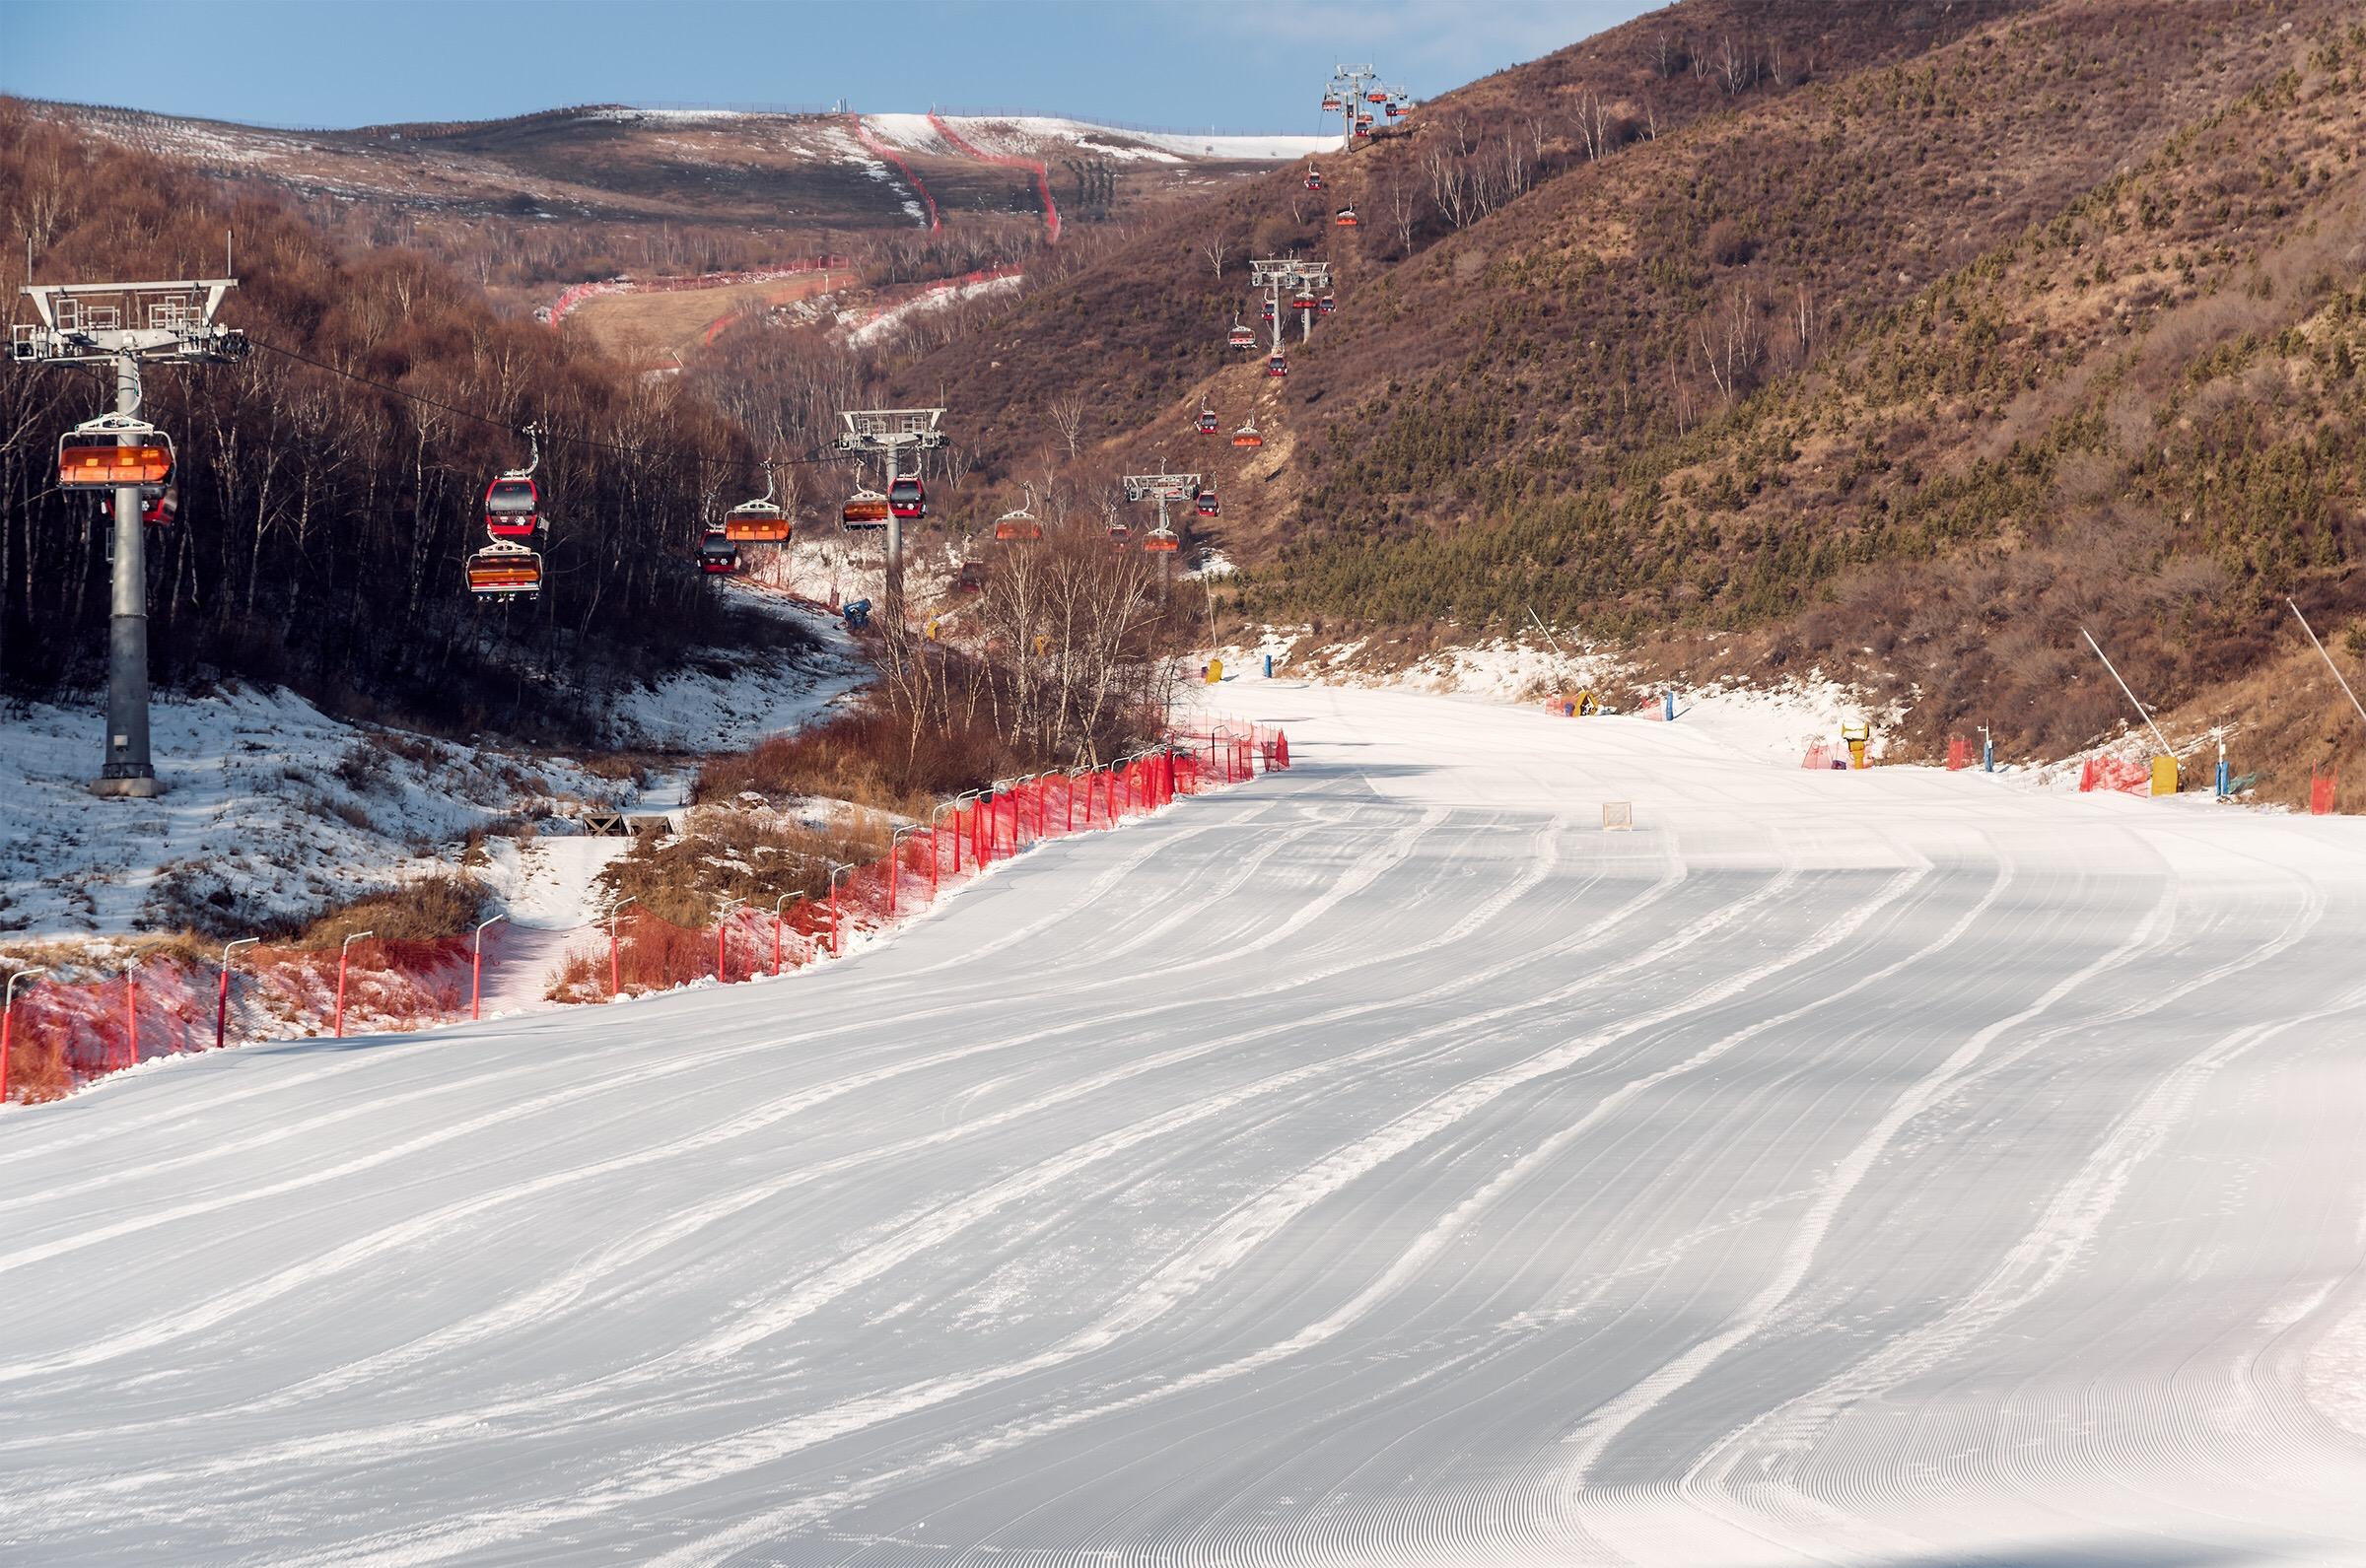 Genting Grand Secret Garden Resort (Yunding Ski Field)